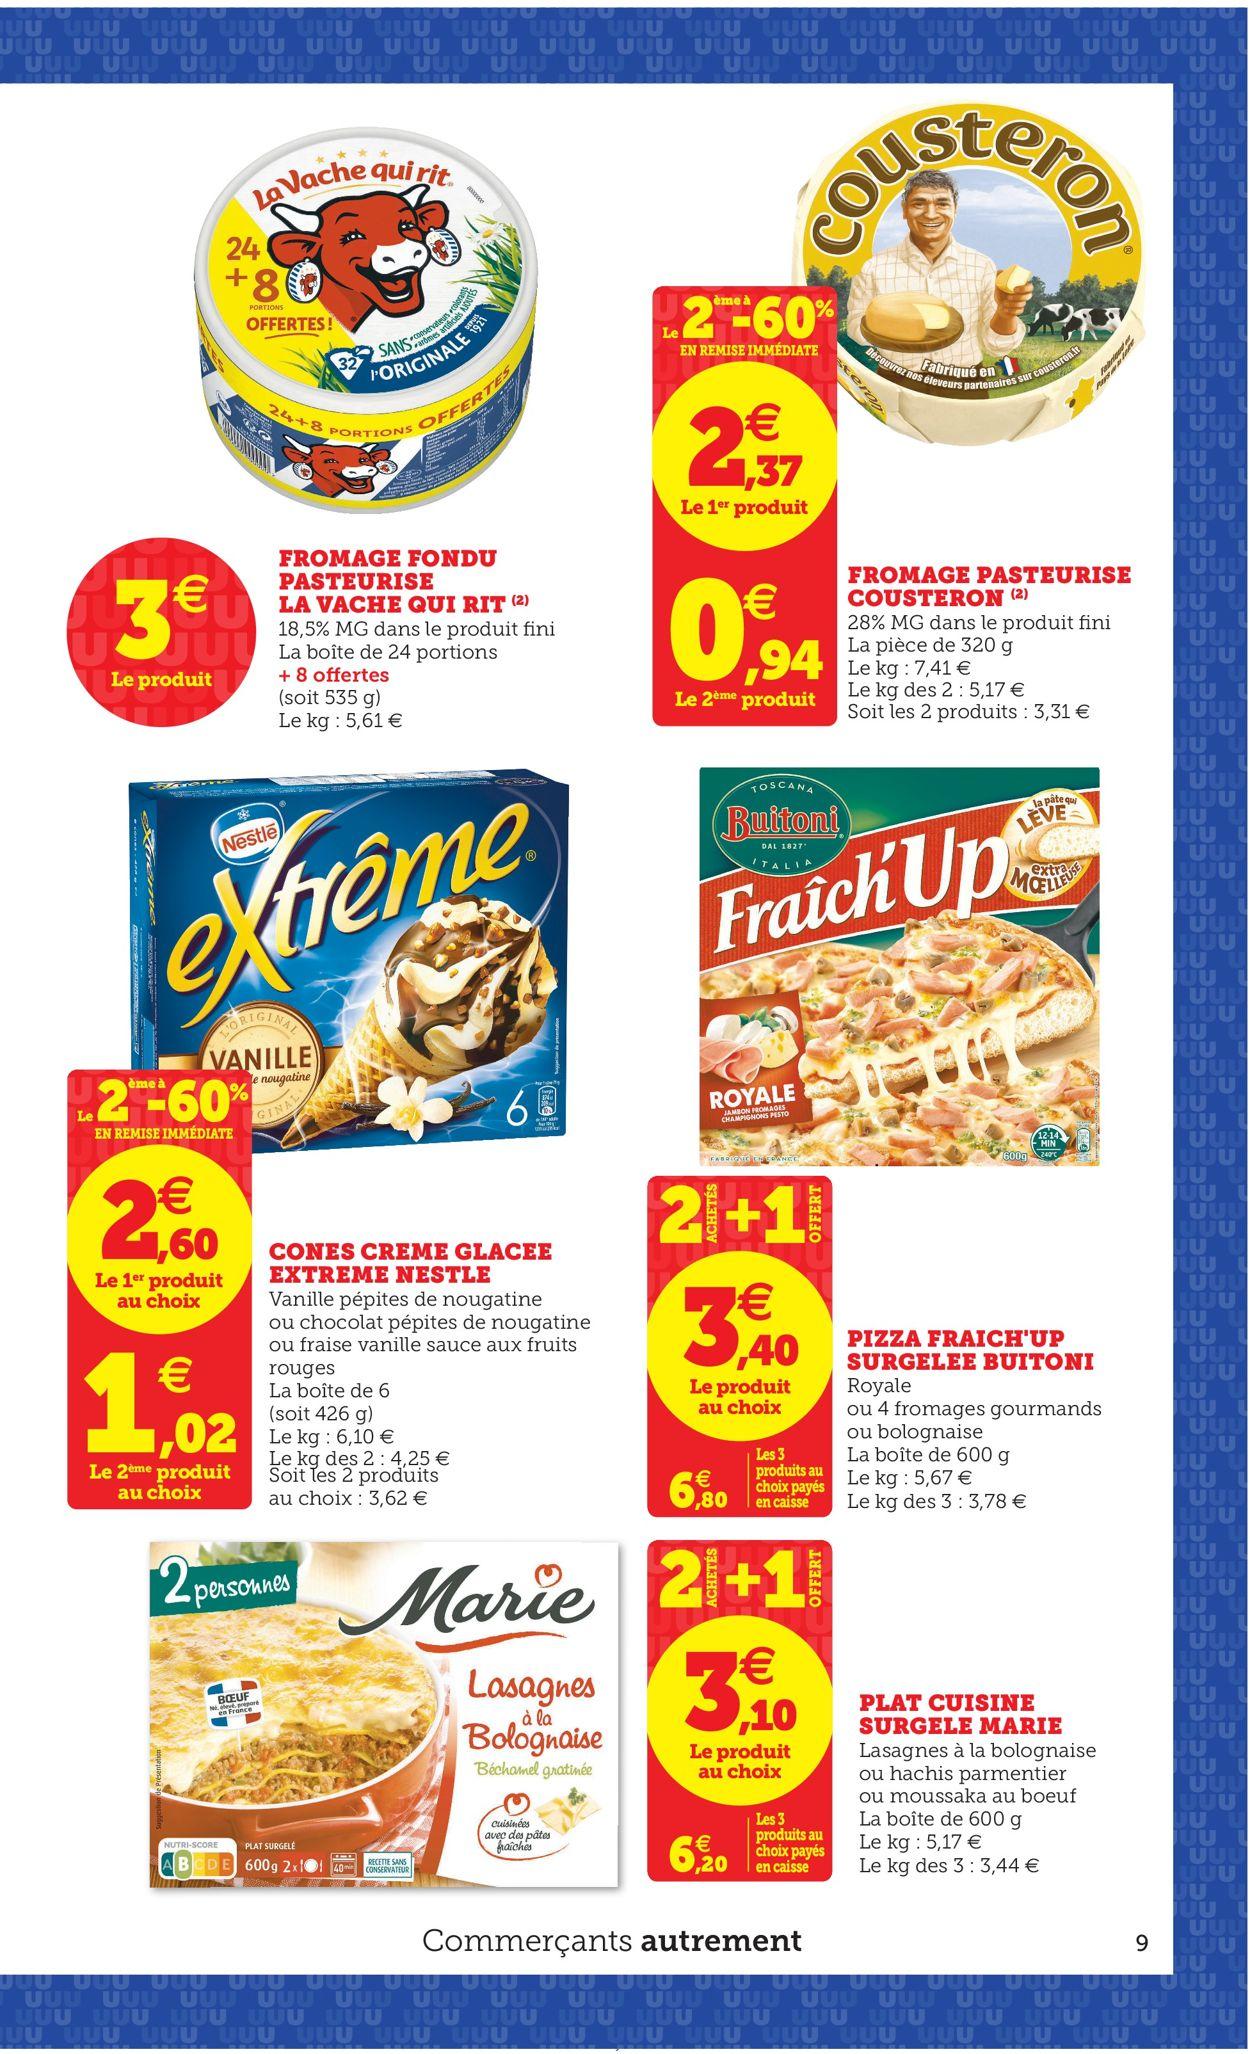 Magasins U Catalogue - 27.10-07.11.2020 (Page 9)